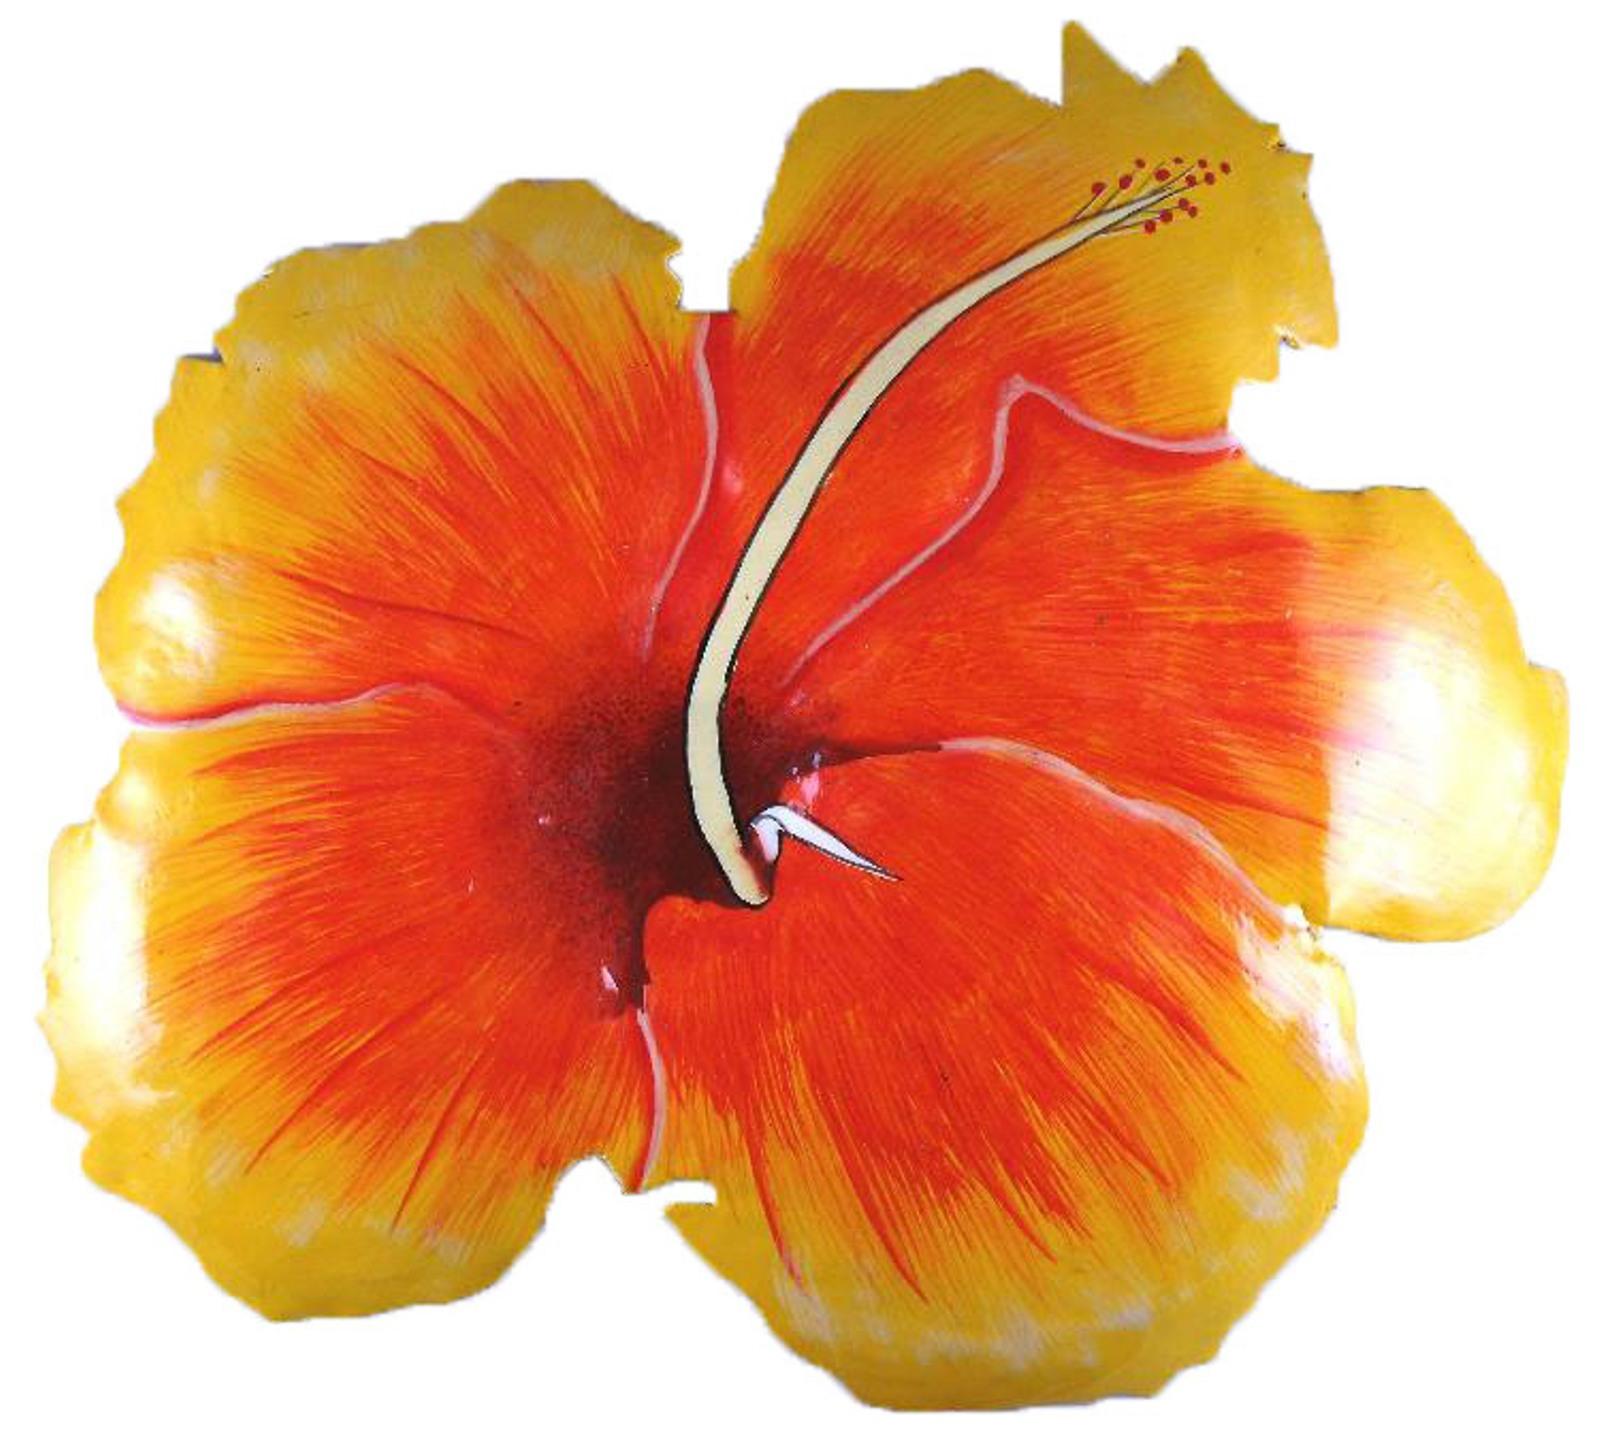 Tropical hibiscus floral haitian metal wall art yellow and orange ebay tropical hibiscus floral haitian metal wall art yellow and orange izmirmasajfo